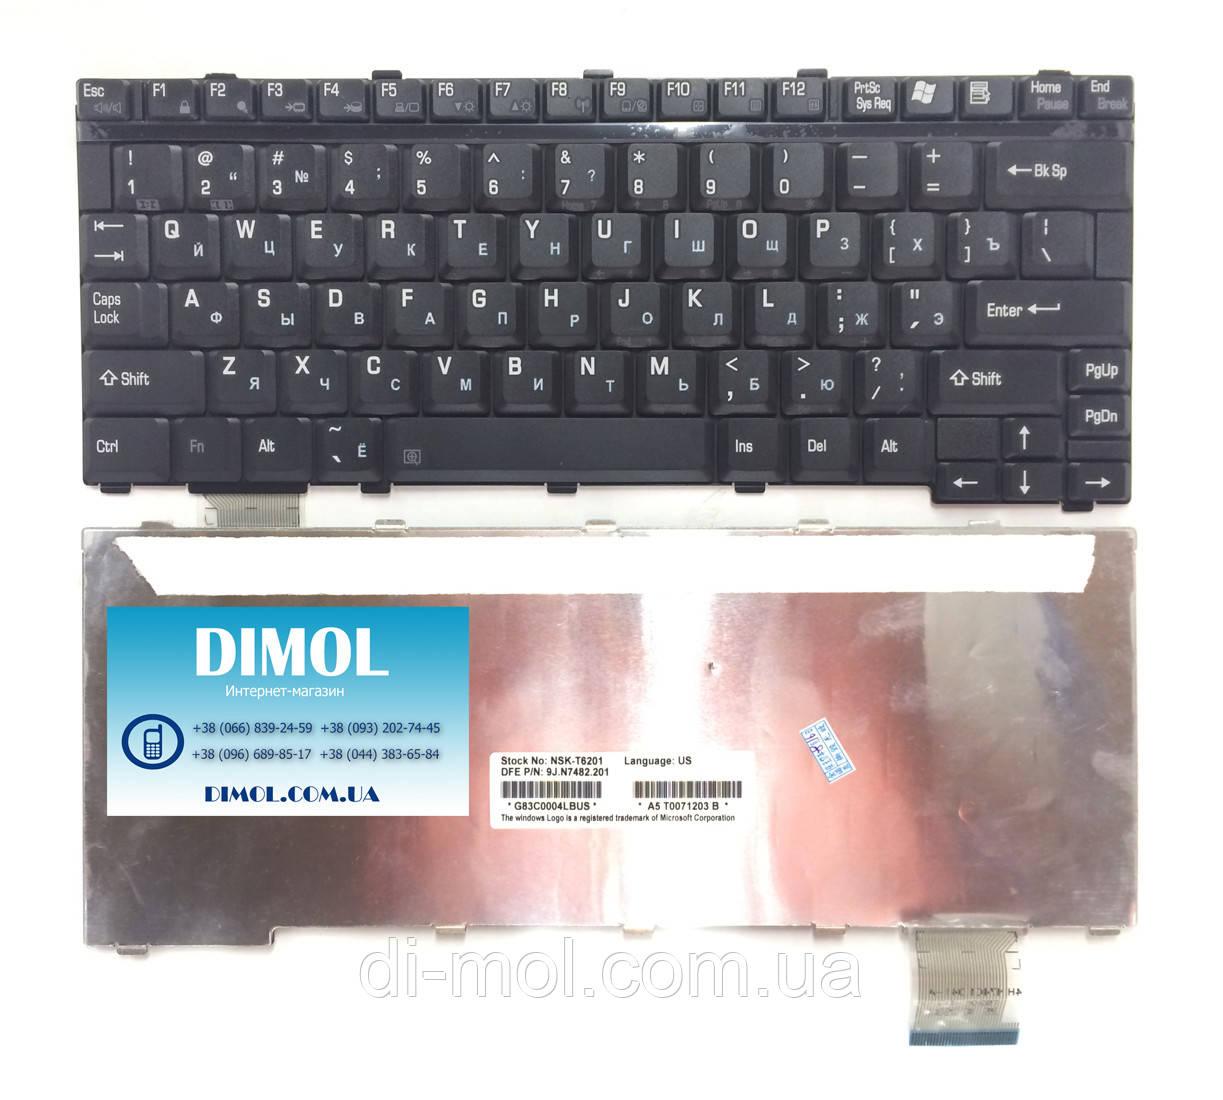 Оригинальная клавиатура для ноутбука Toshiba Satellite U300, U305 series, ru, black